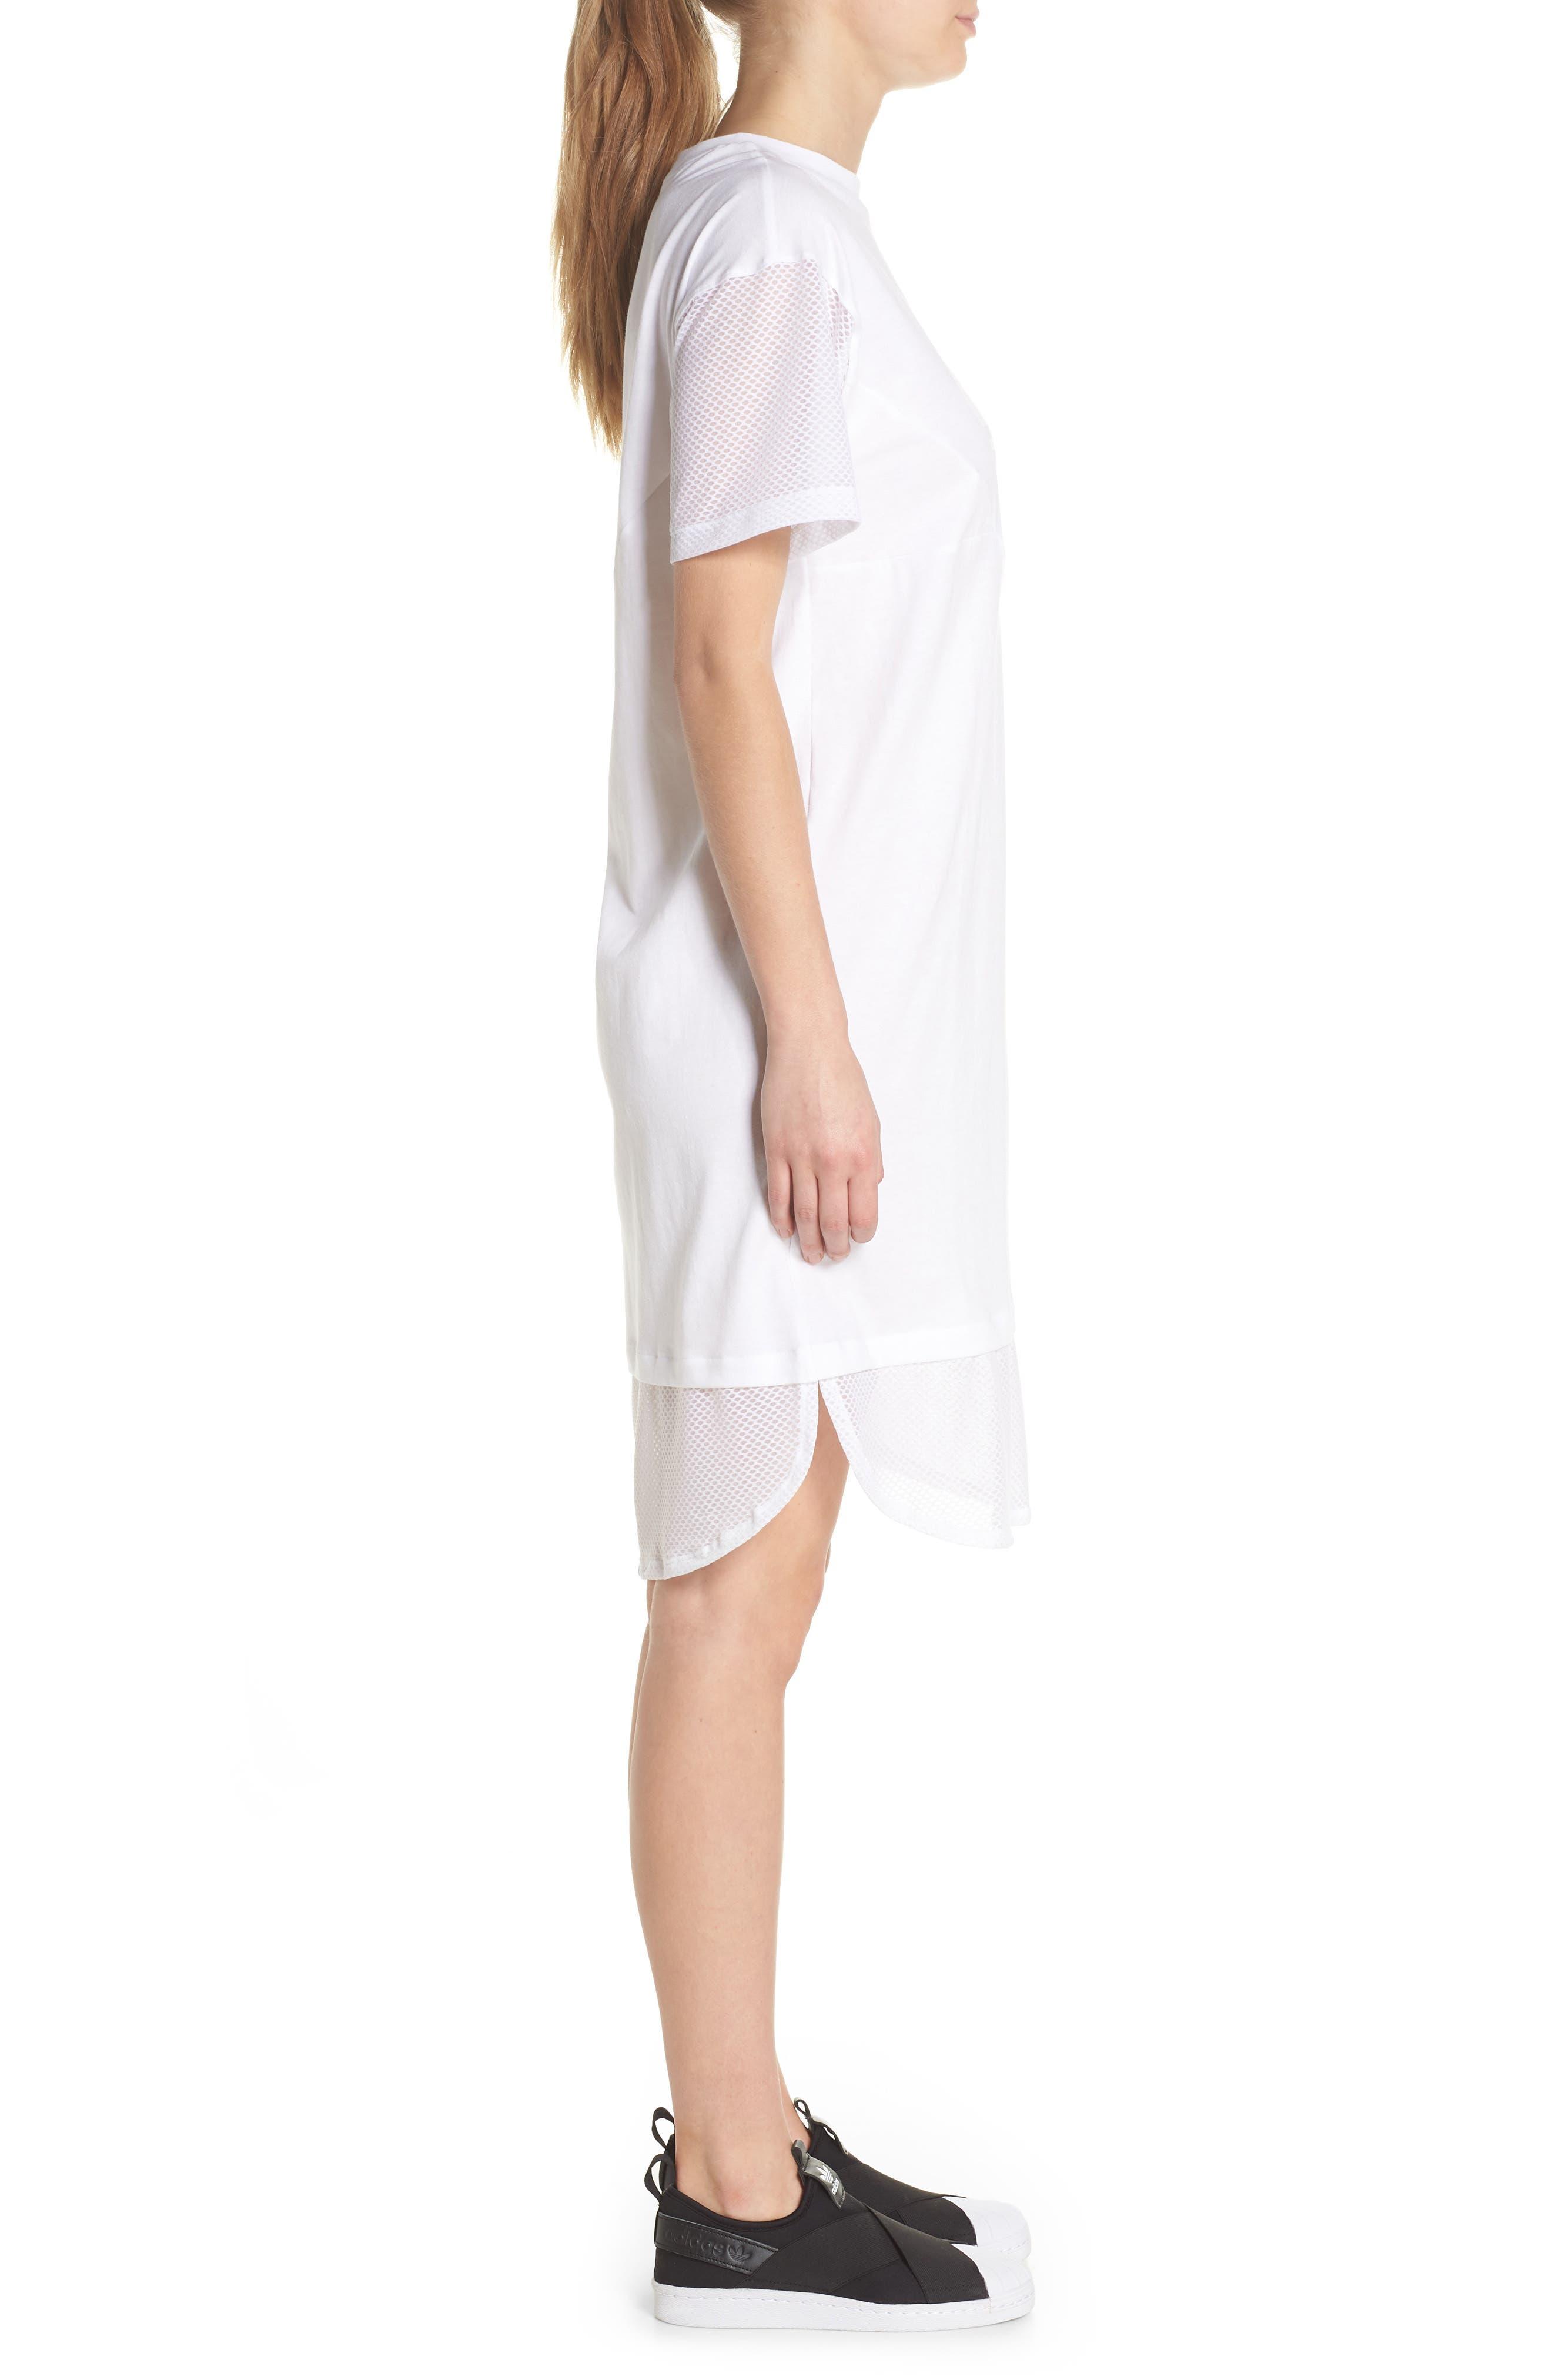 CLRDO T-Shirt Dress,                             Alternate thumbnail 3, color,                             100